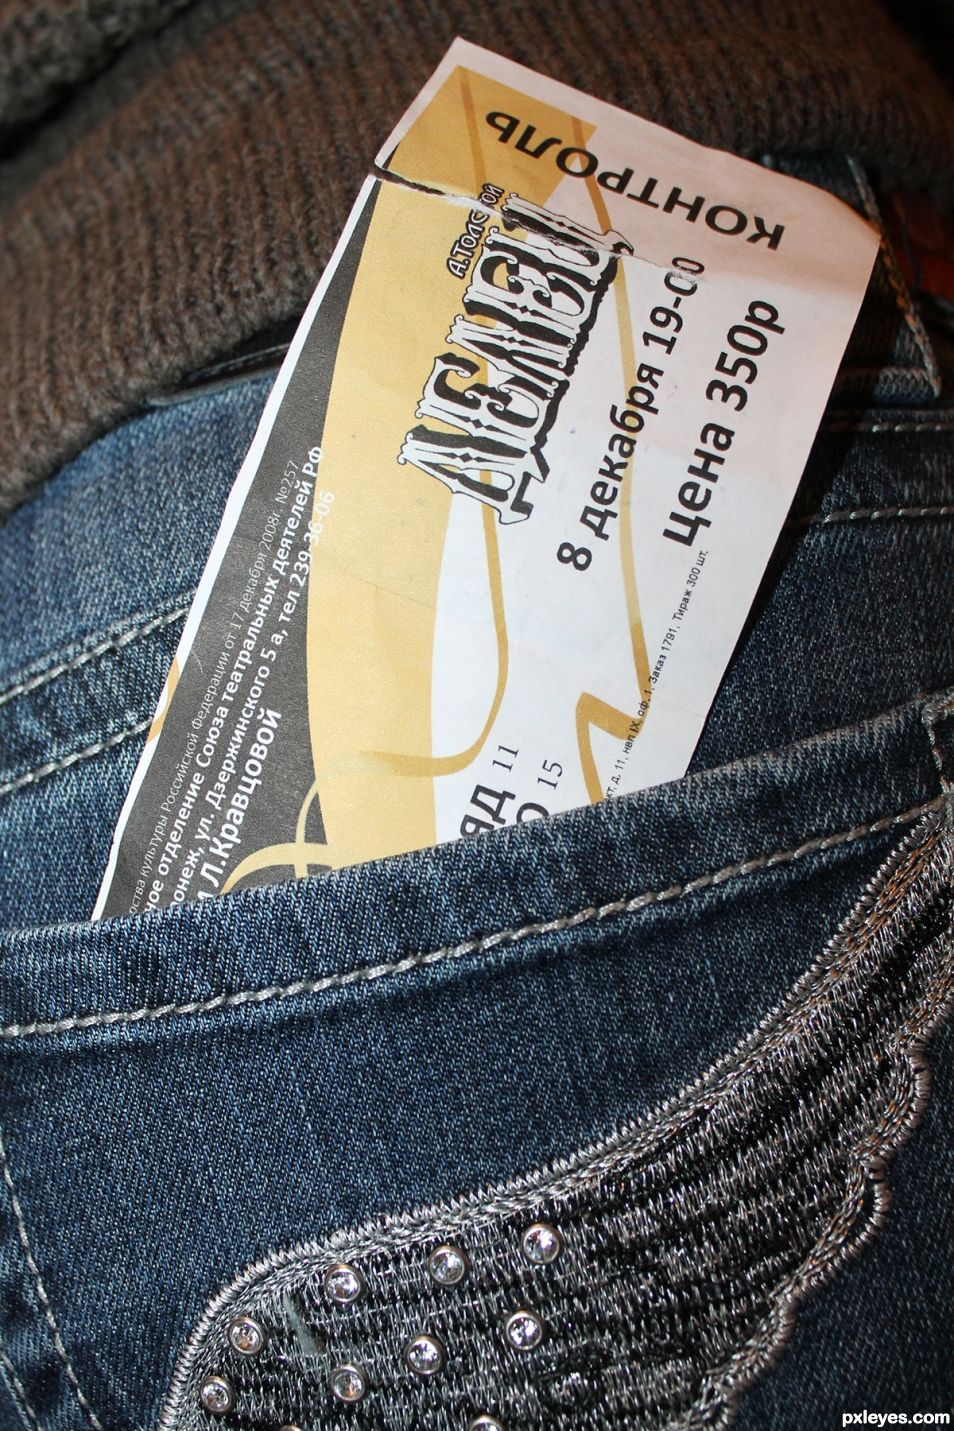 The theatre ticket